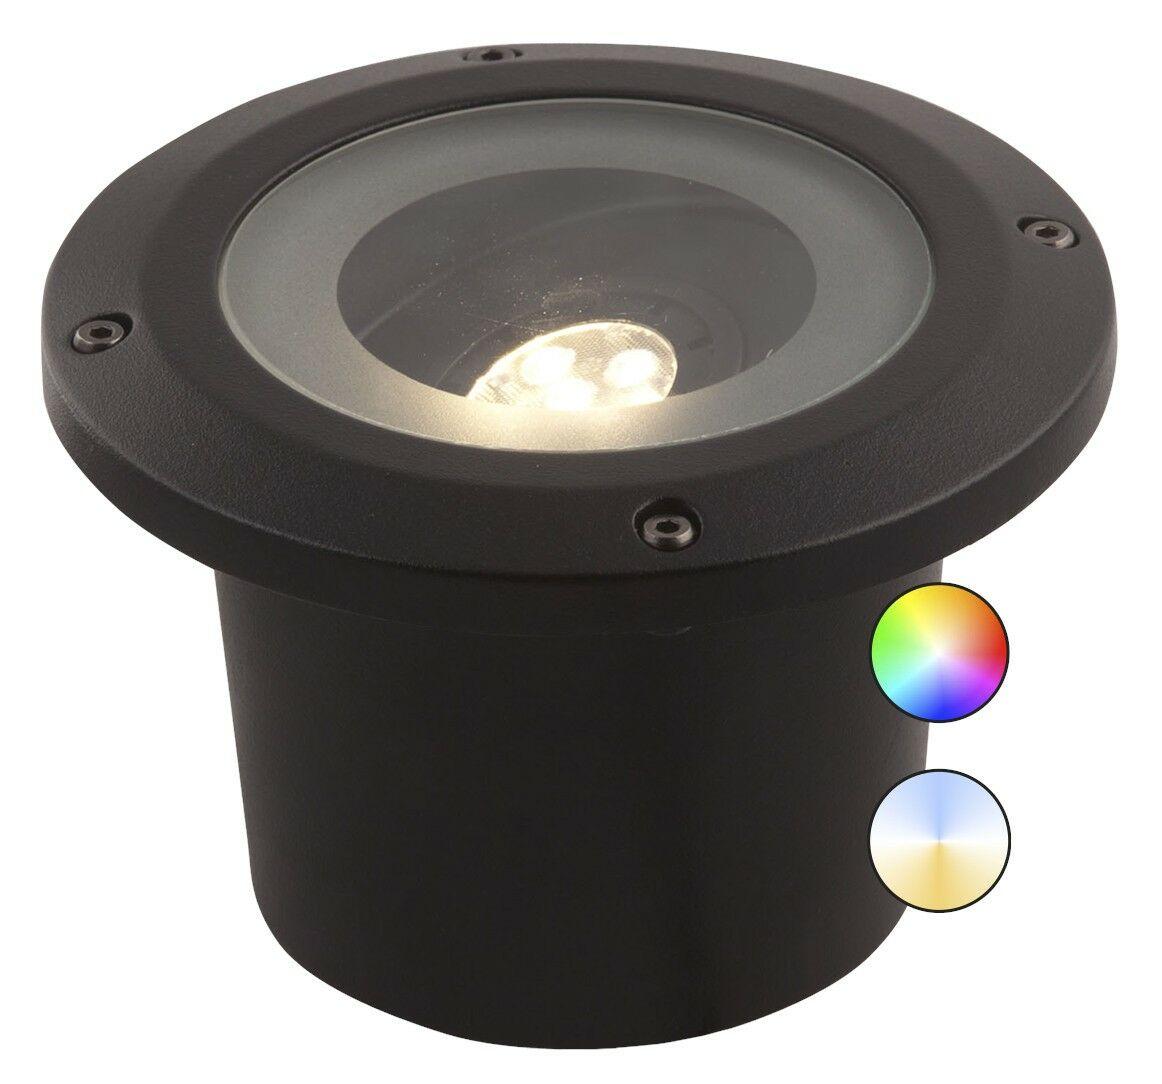 Garden Lights Tuinspot Rubum Plus Smart LED | Tuinverlichting